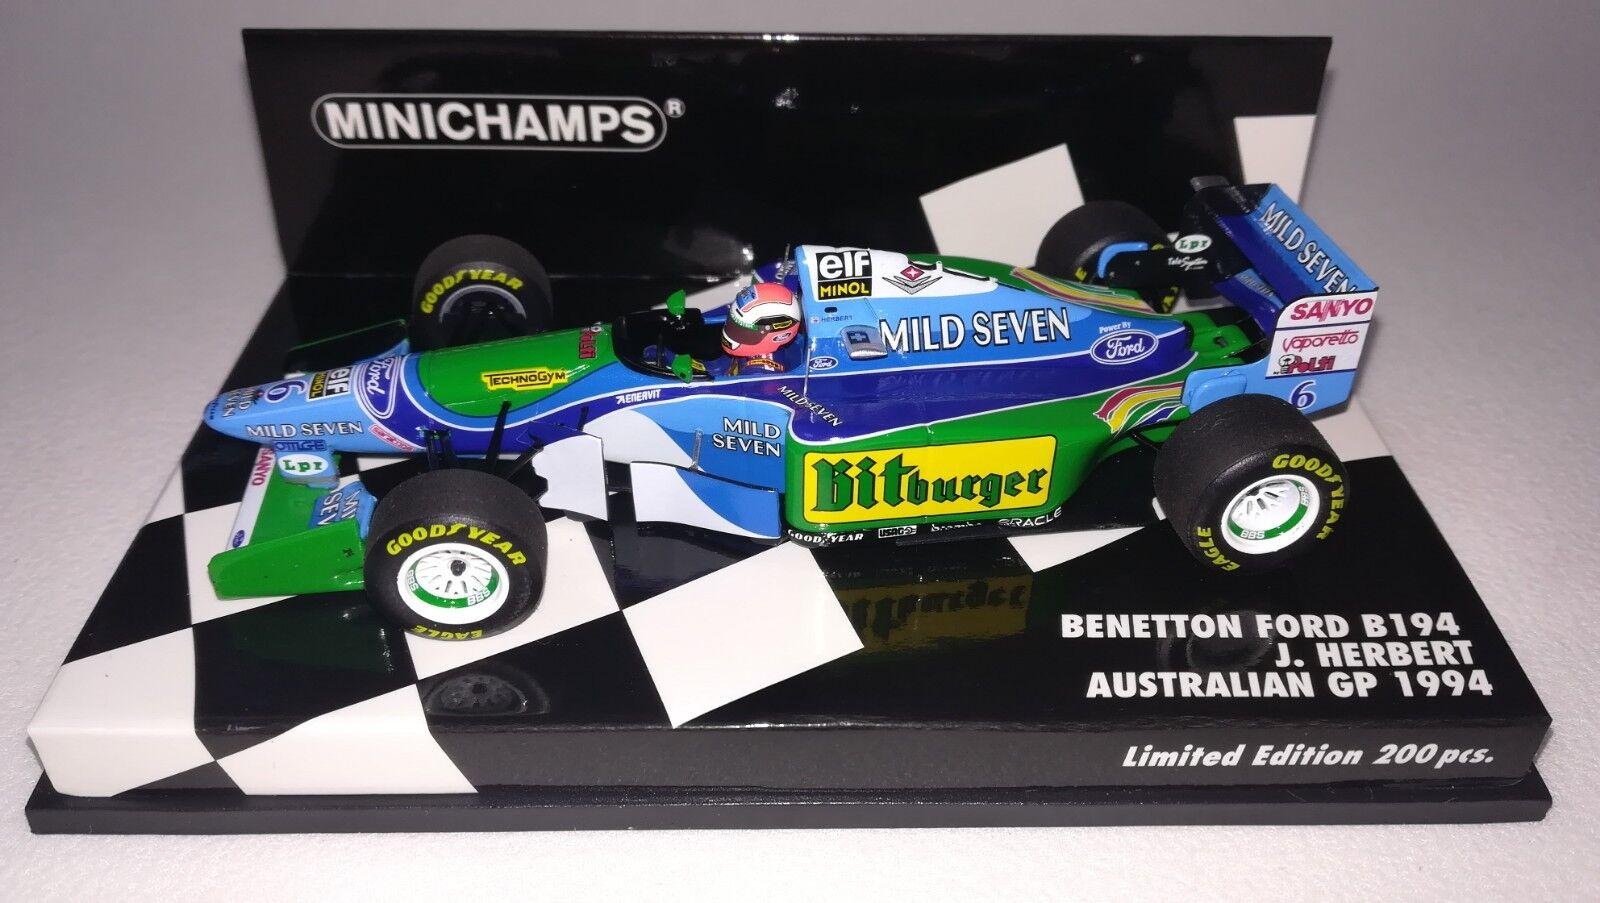 Minichamps F1 Benetton B194 Johnny Herbert 1 43 Australian GP 1994 'Mild Seven'